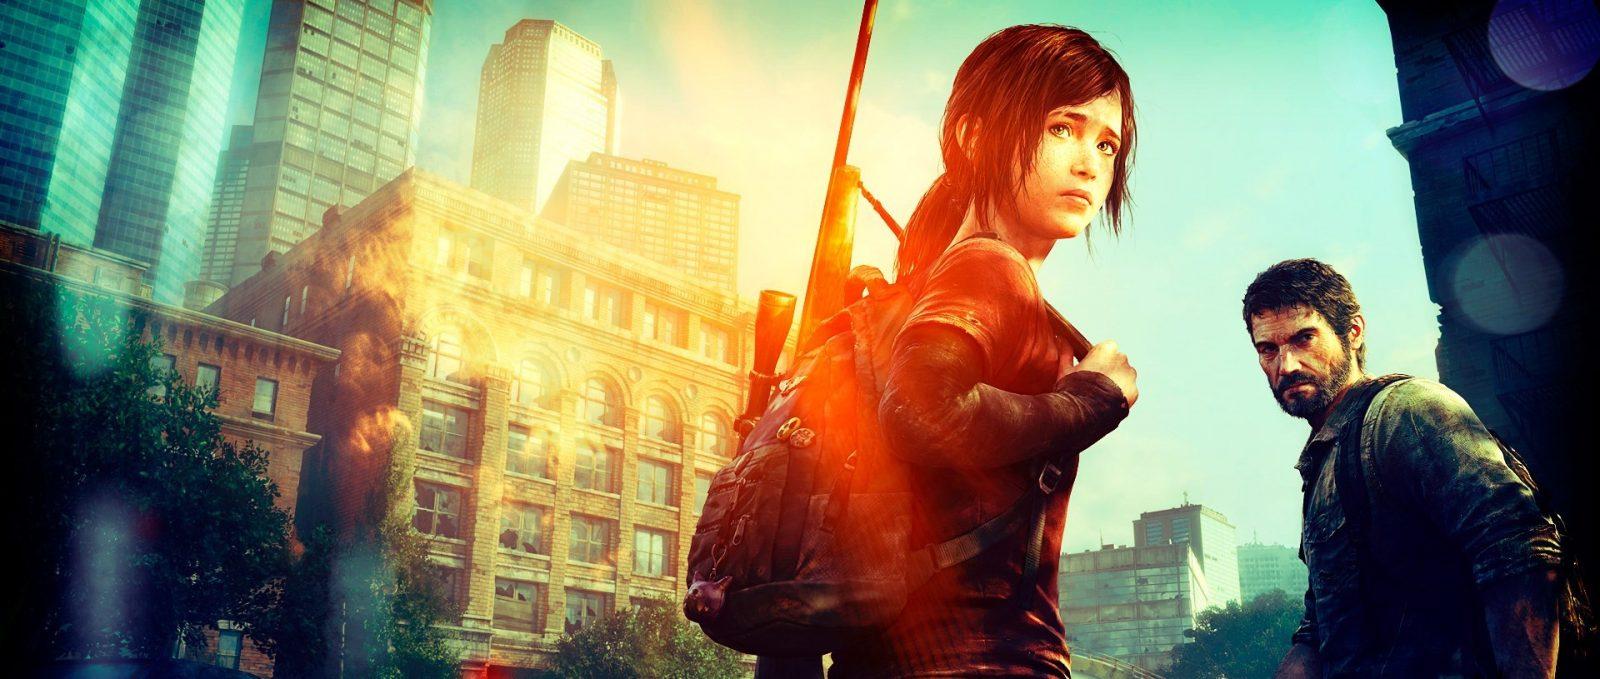 HBO экранизирует игру «The Last of Us»